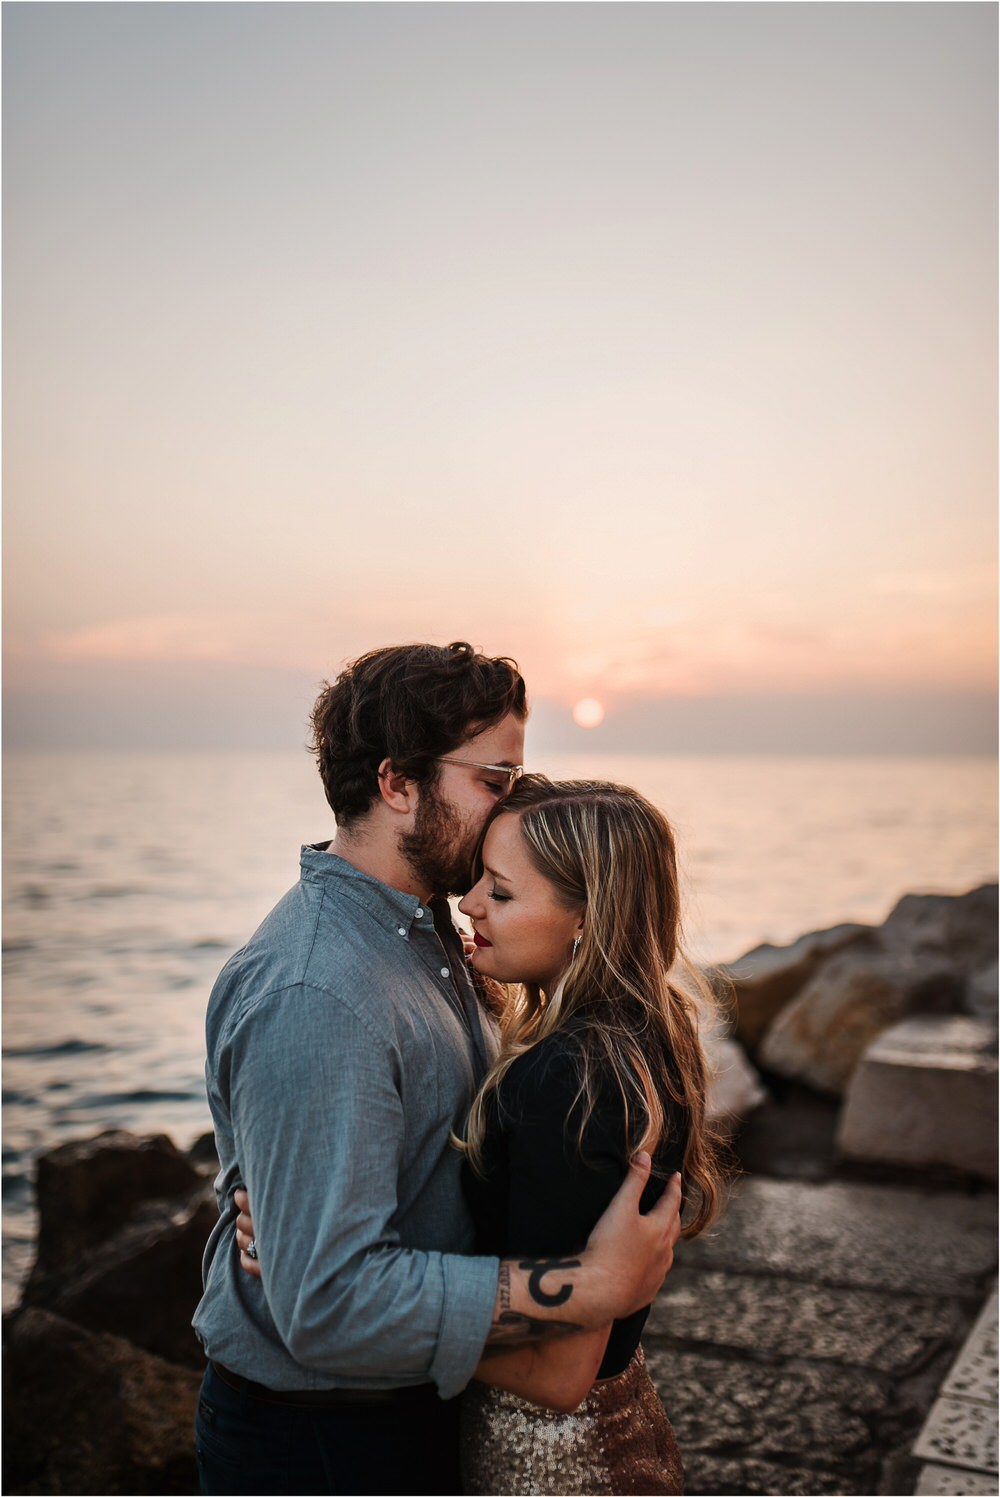 piran wedding photographer engagement anniversary honeymoon photography recommended slovenia seaside photographer  0059.jpg